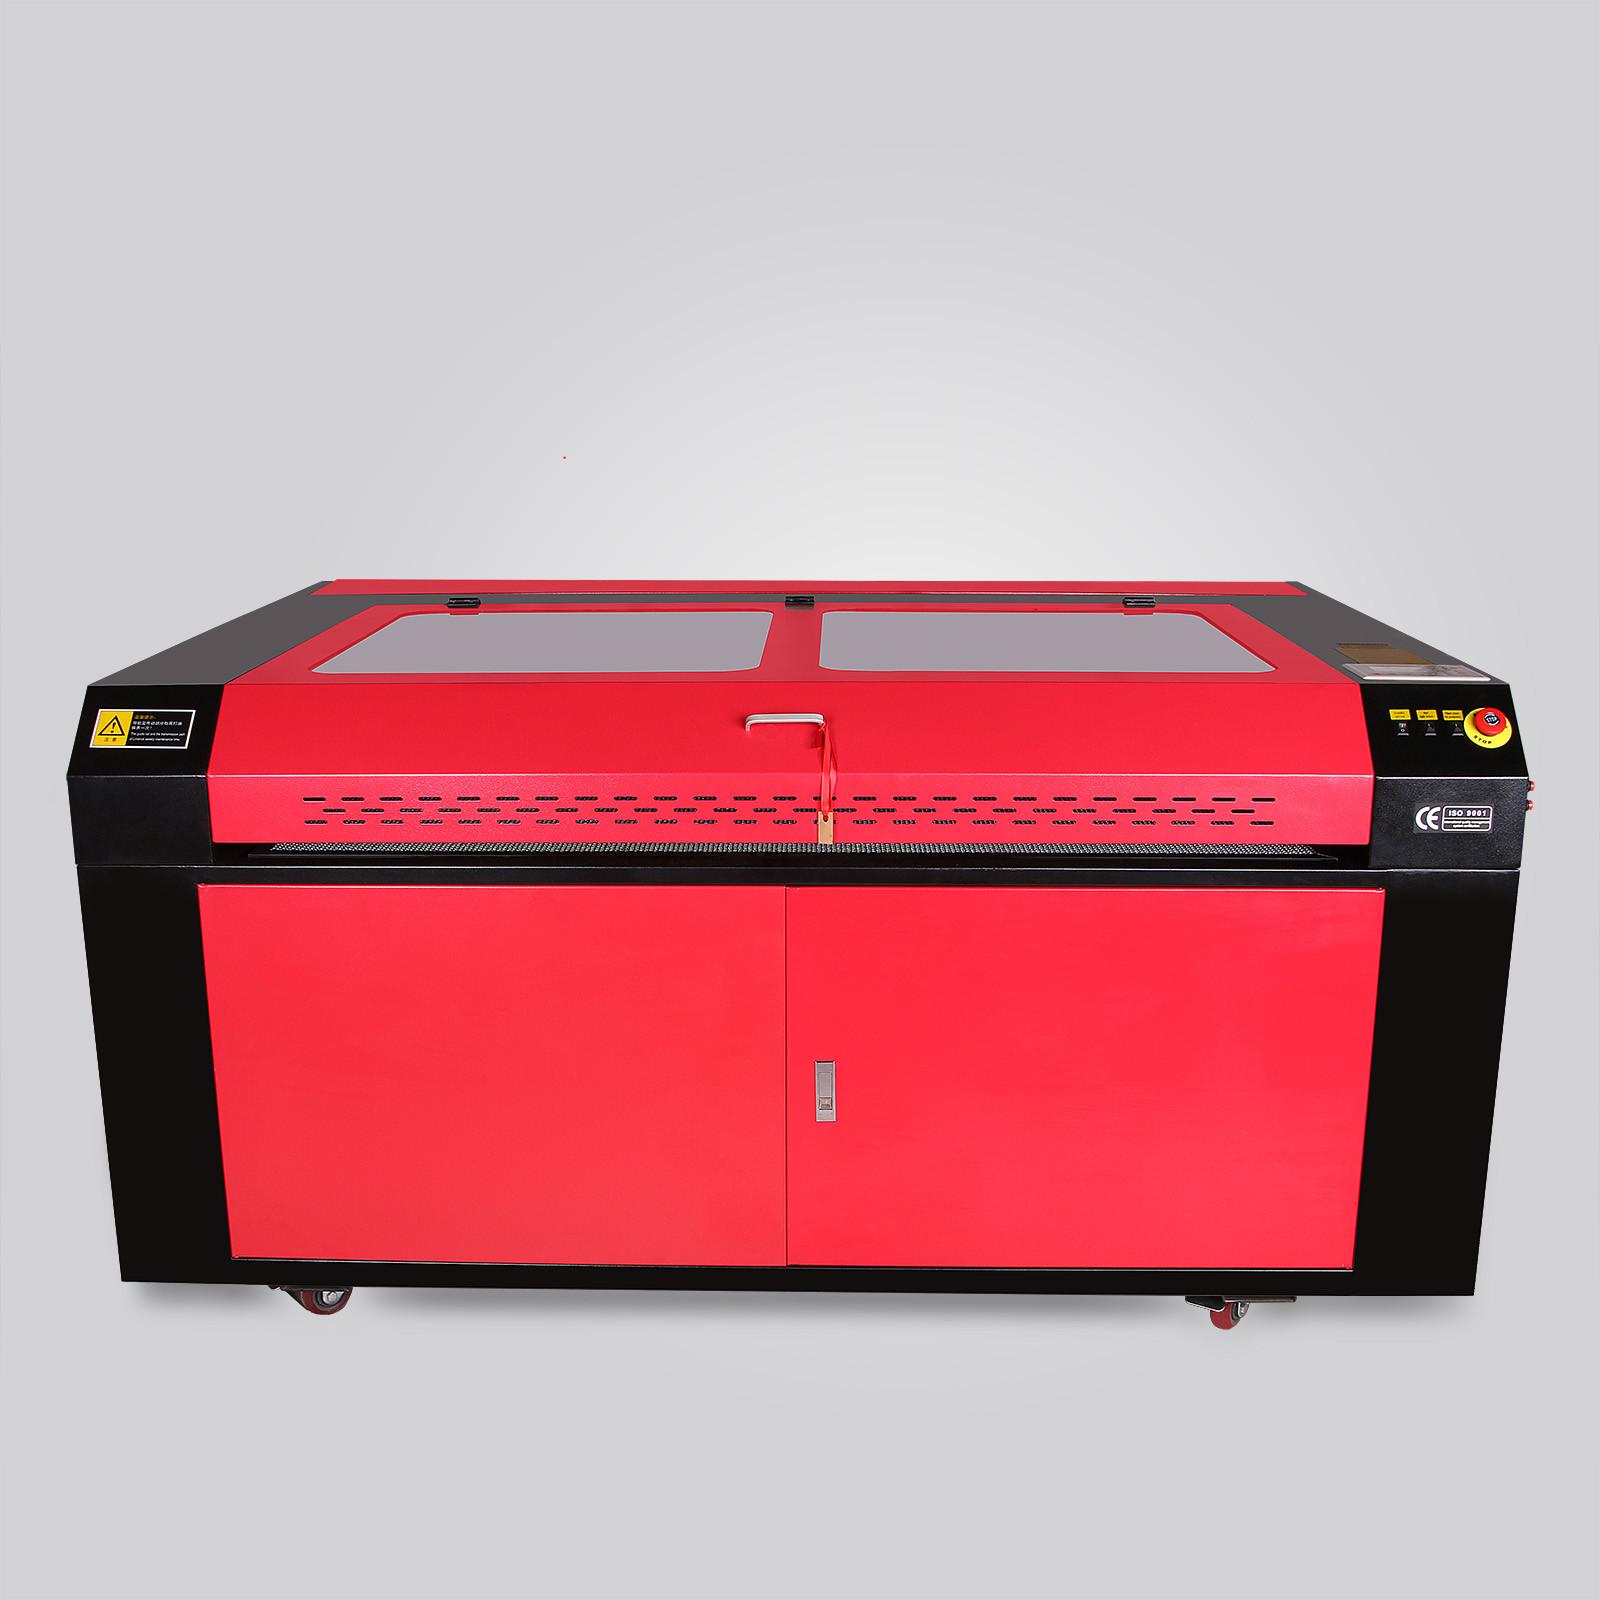 Macchina-per-Incisione-Laser-CO2-40-130W-Asse-Rotante-Tagliatrice-Incisore miniatura 73